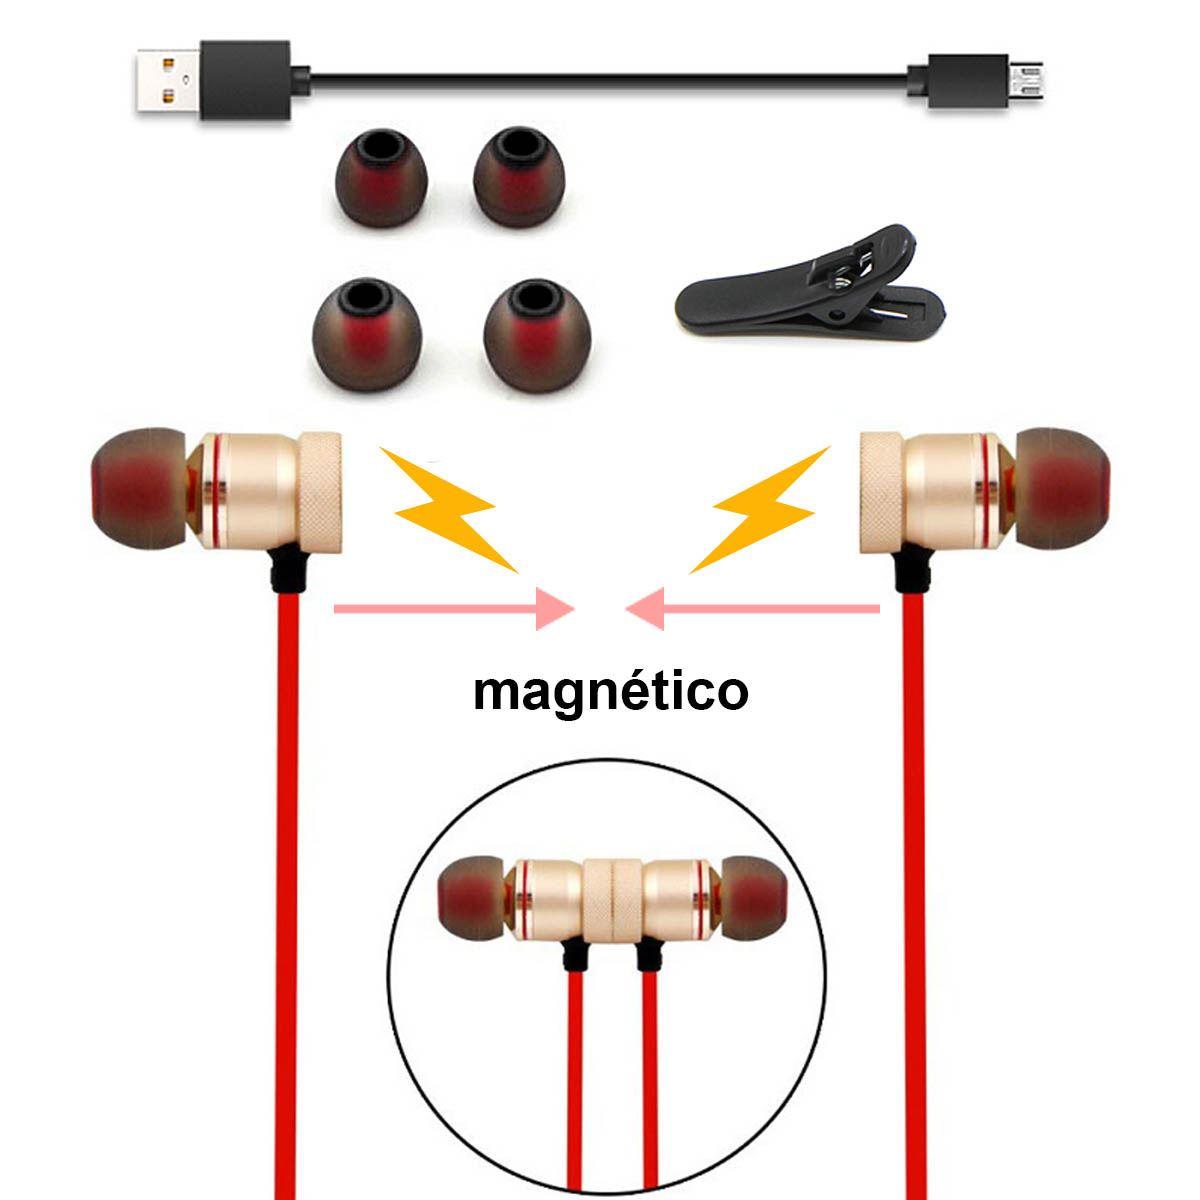 CASCOS-AURICULARES-MAGNETICOS-DEPORTIVOS-BLUETOOTH-INALAMBRICOS-RUNNING-DEPORTES miniatura 4